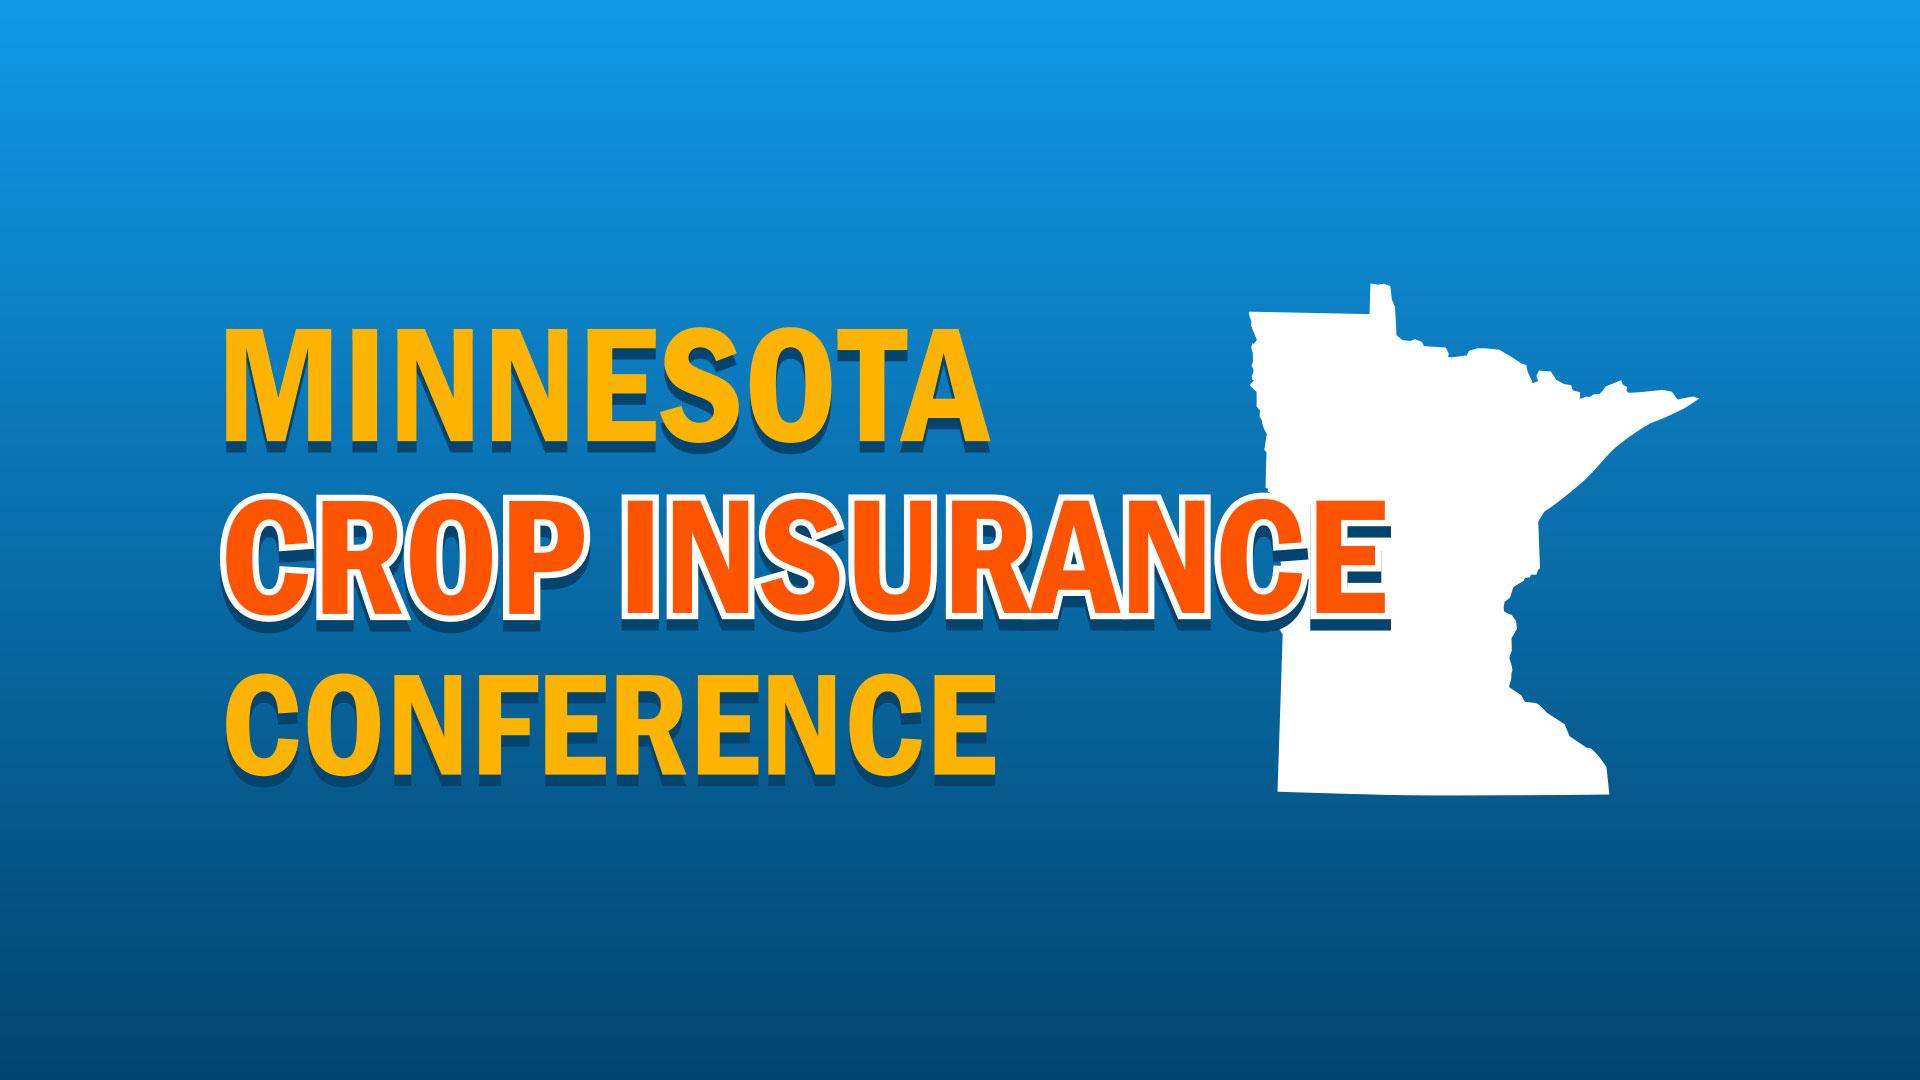 2020 Minnesota Crop Insurance Conference